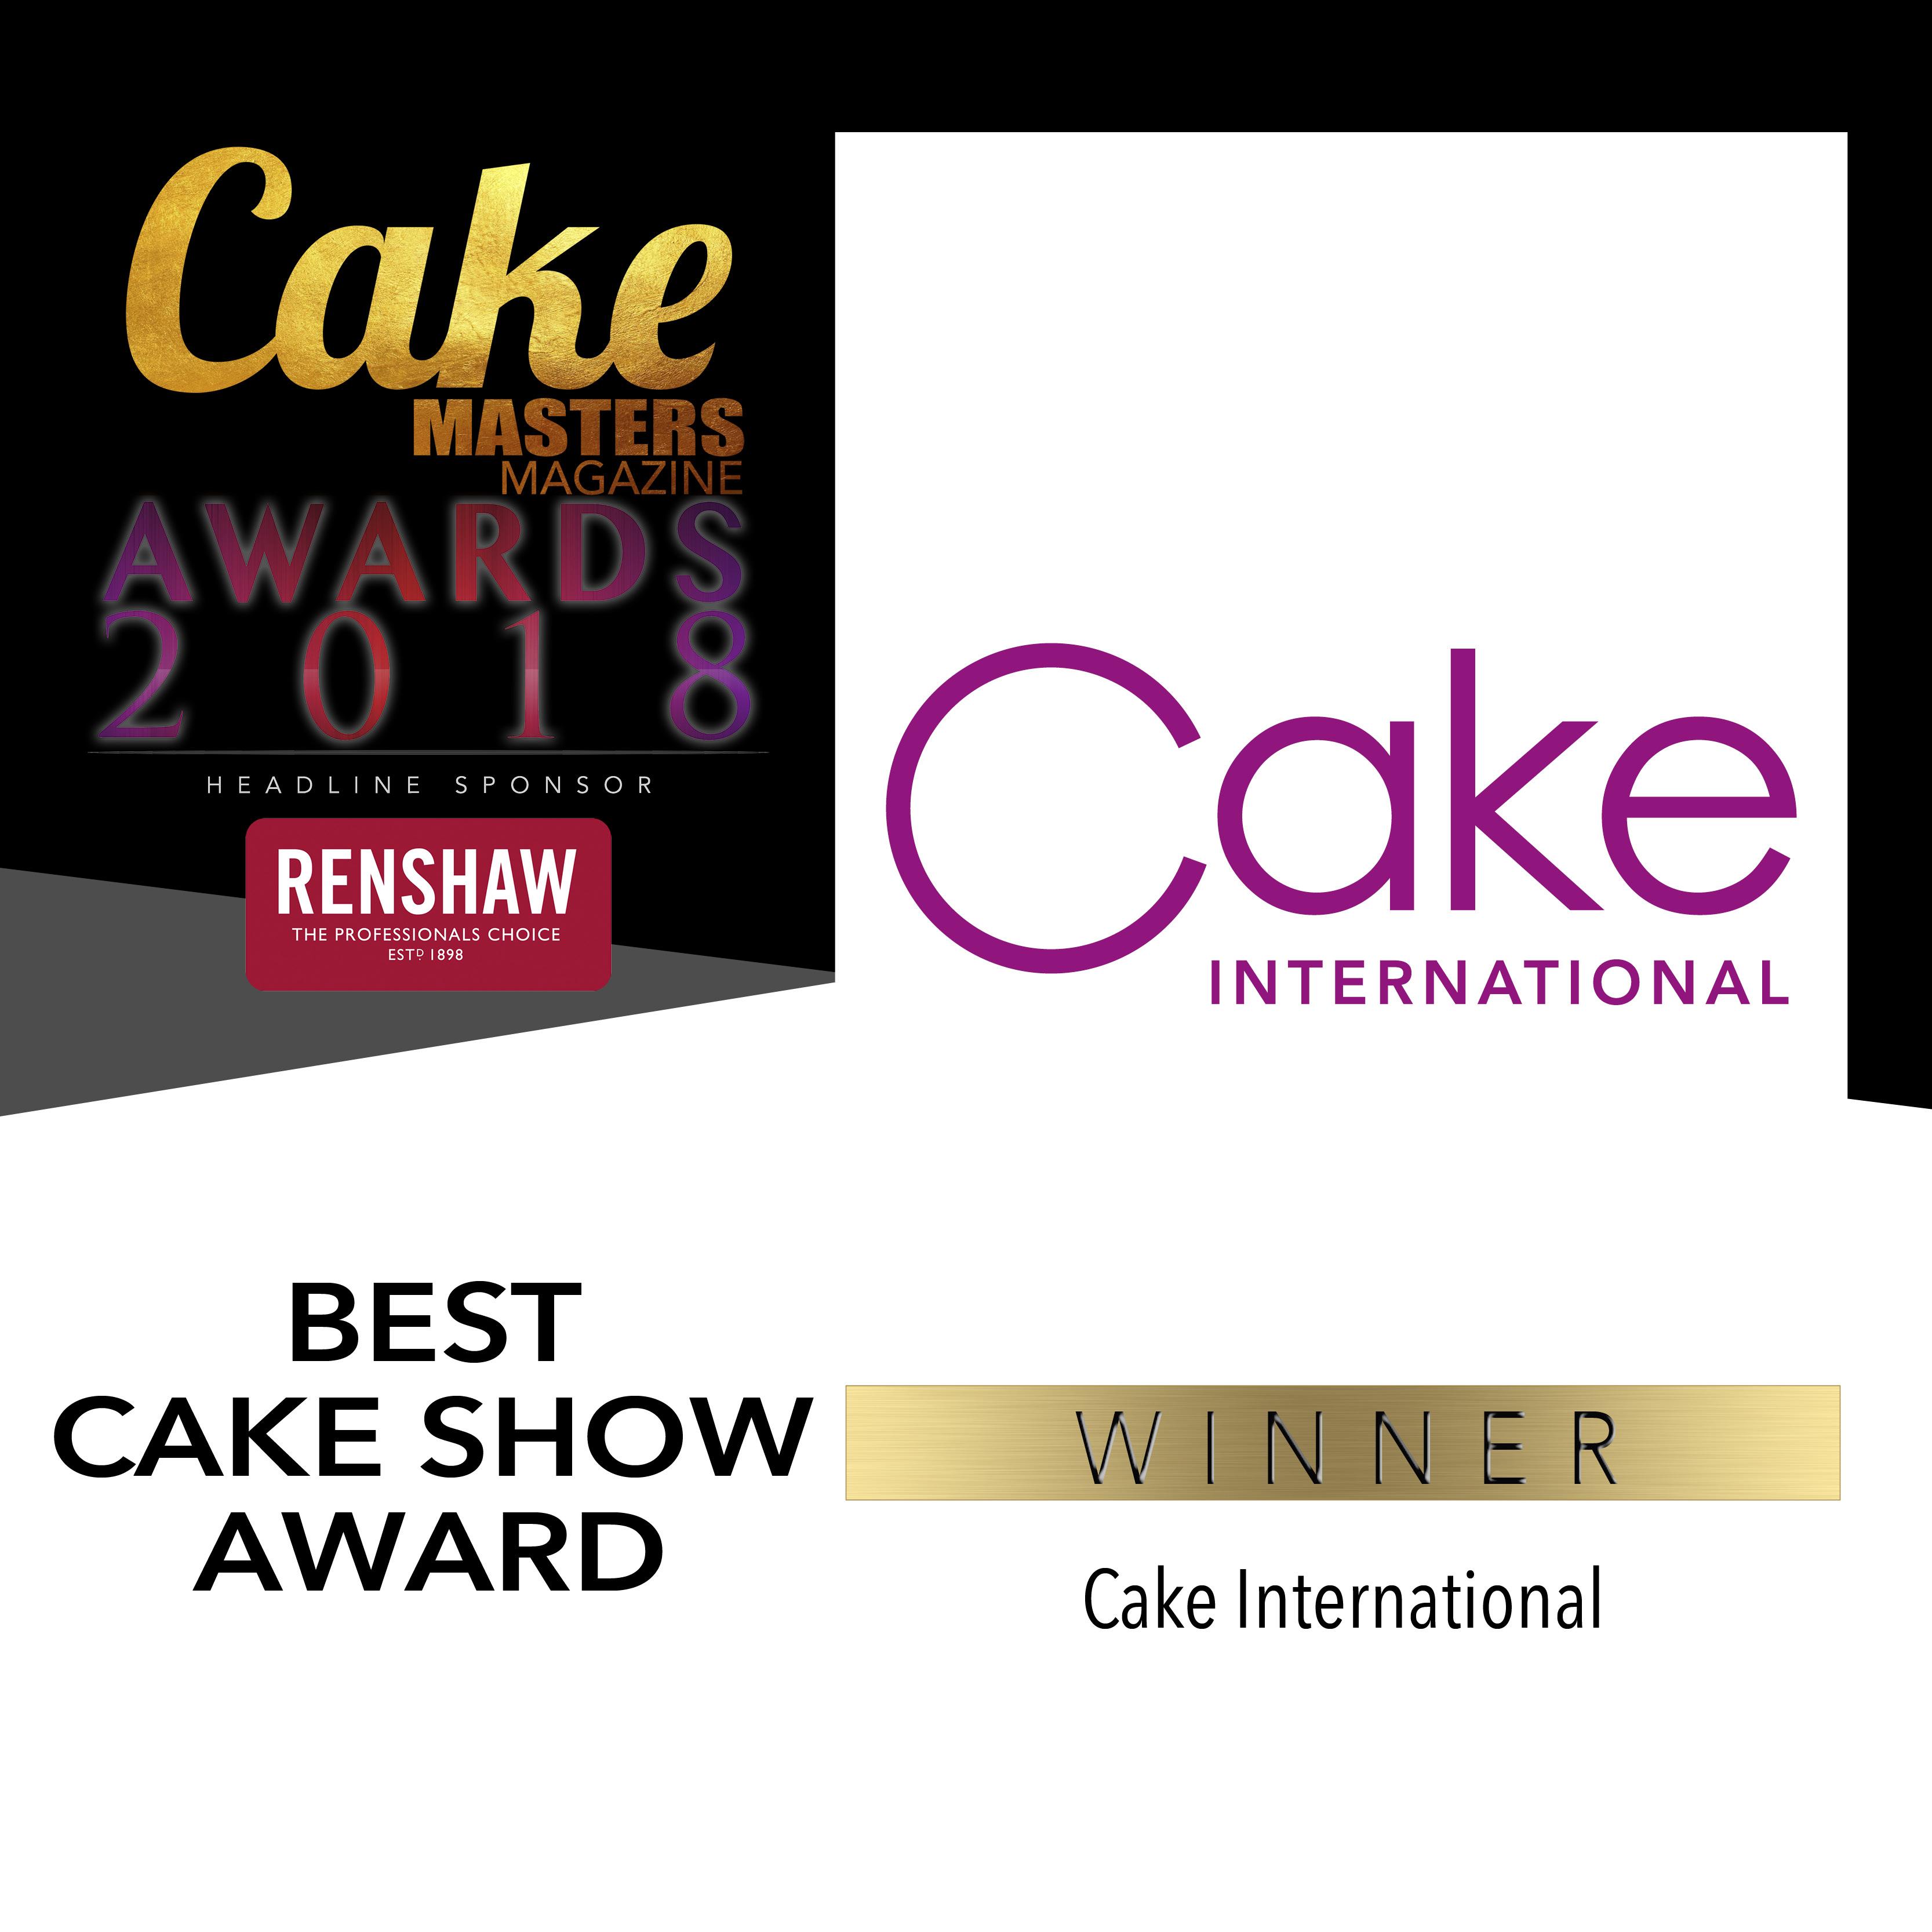 Best Cake Show